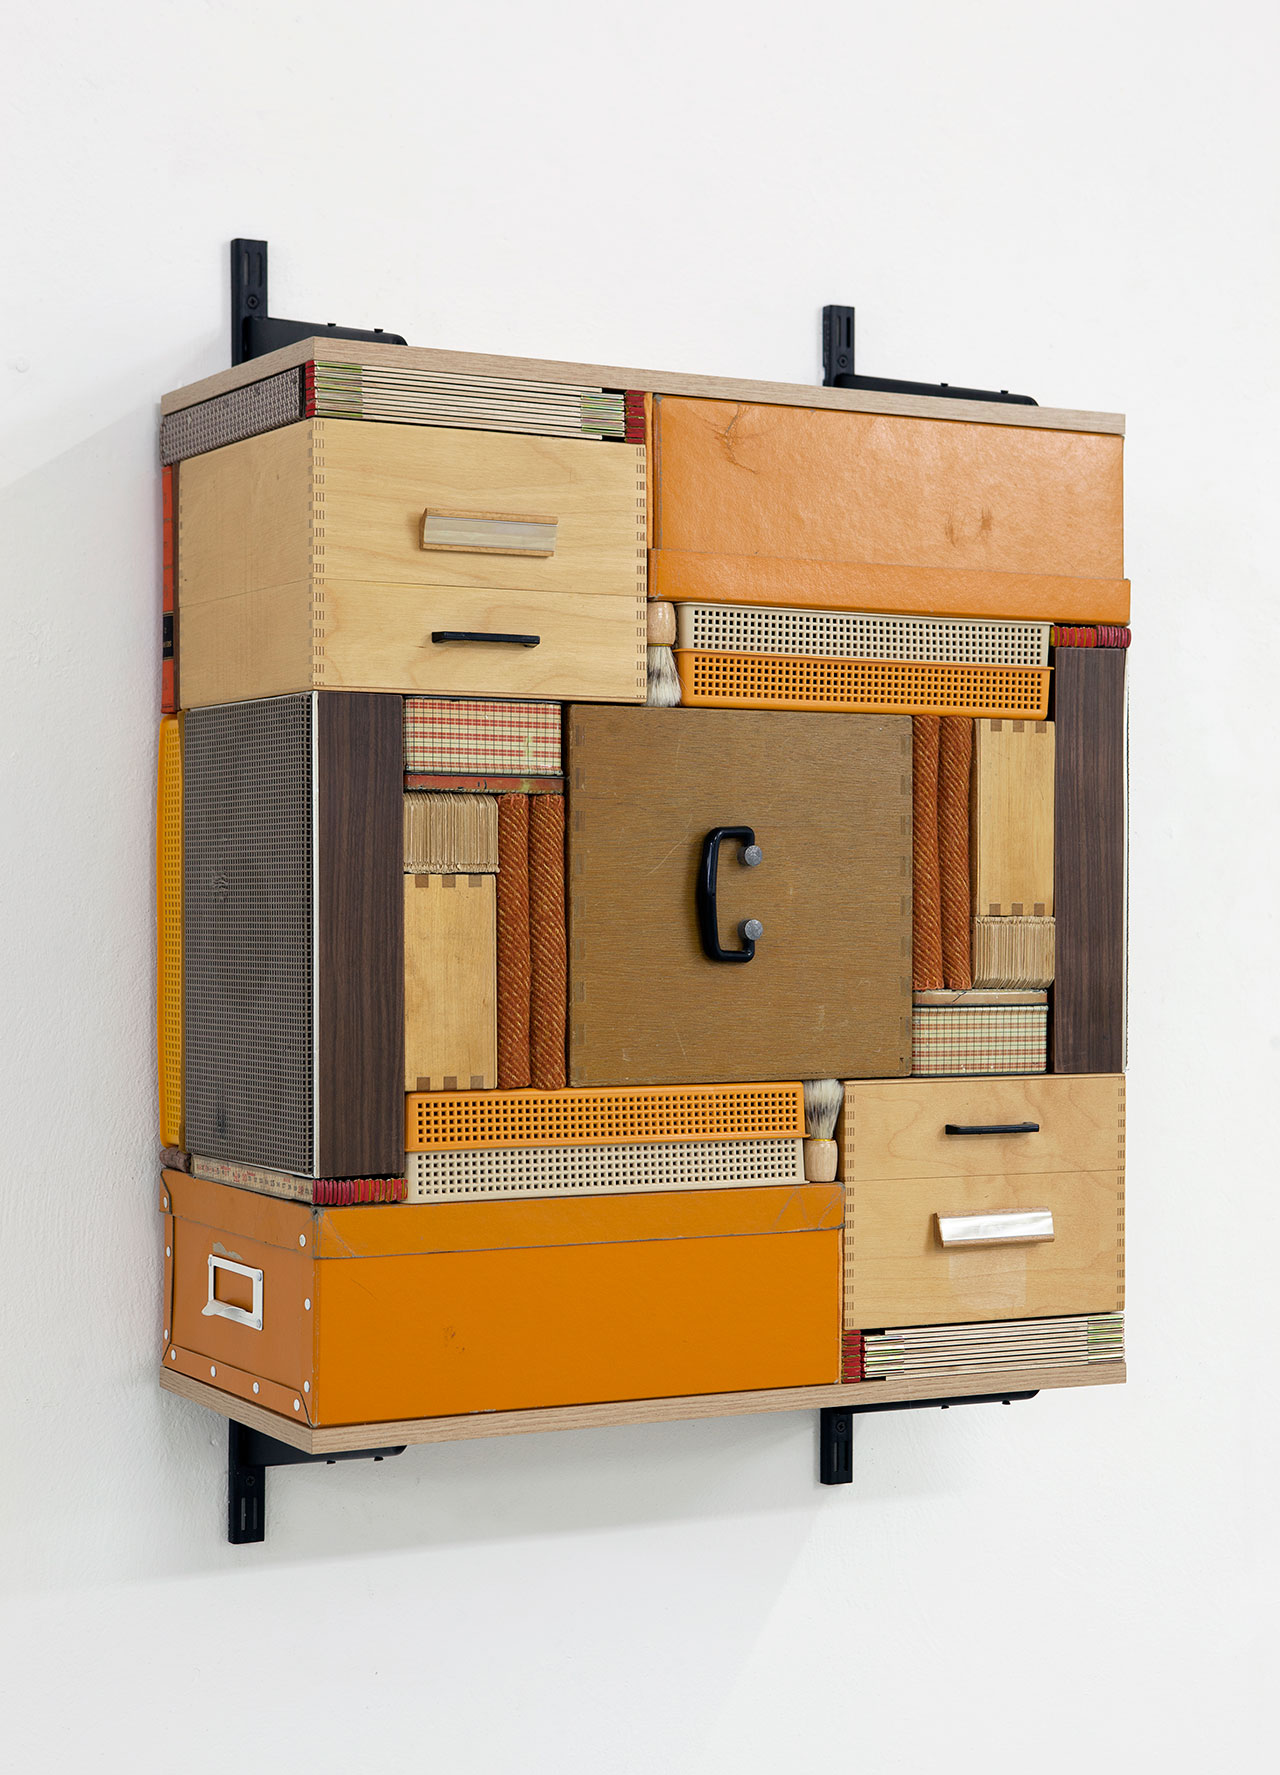 Michael Johansson, Flip Shelf (orange), 2018, ordinary items, shelfs, 100x72x31,5 cm. Courtesy: The Flat – Massimo Carasi, Milan. Photo © Michael Johansson.